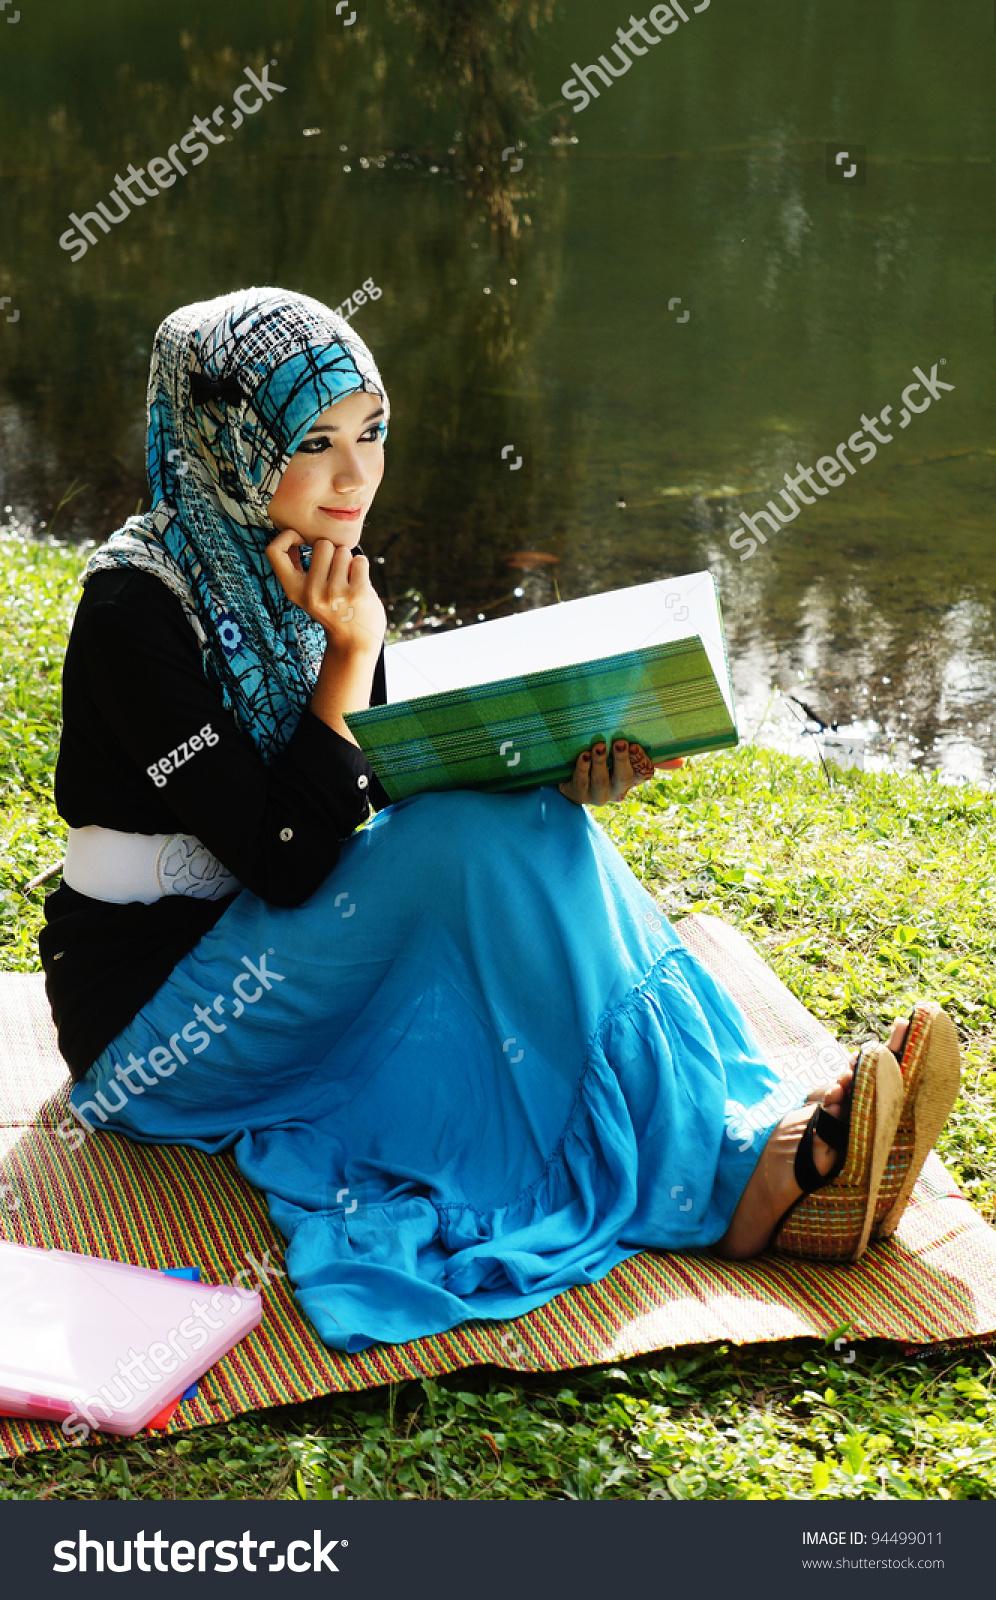 muslim single women in lake Read our expert reviews and user reviews of the most popular history of muslim women  blackjack game online single black women in  rock lake.